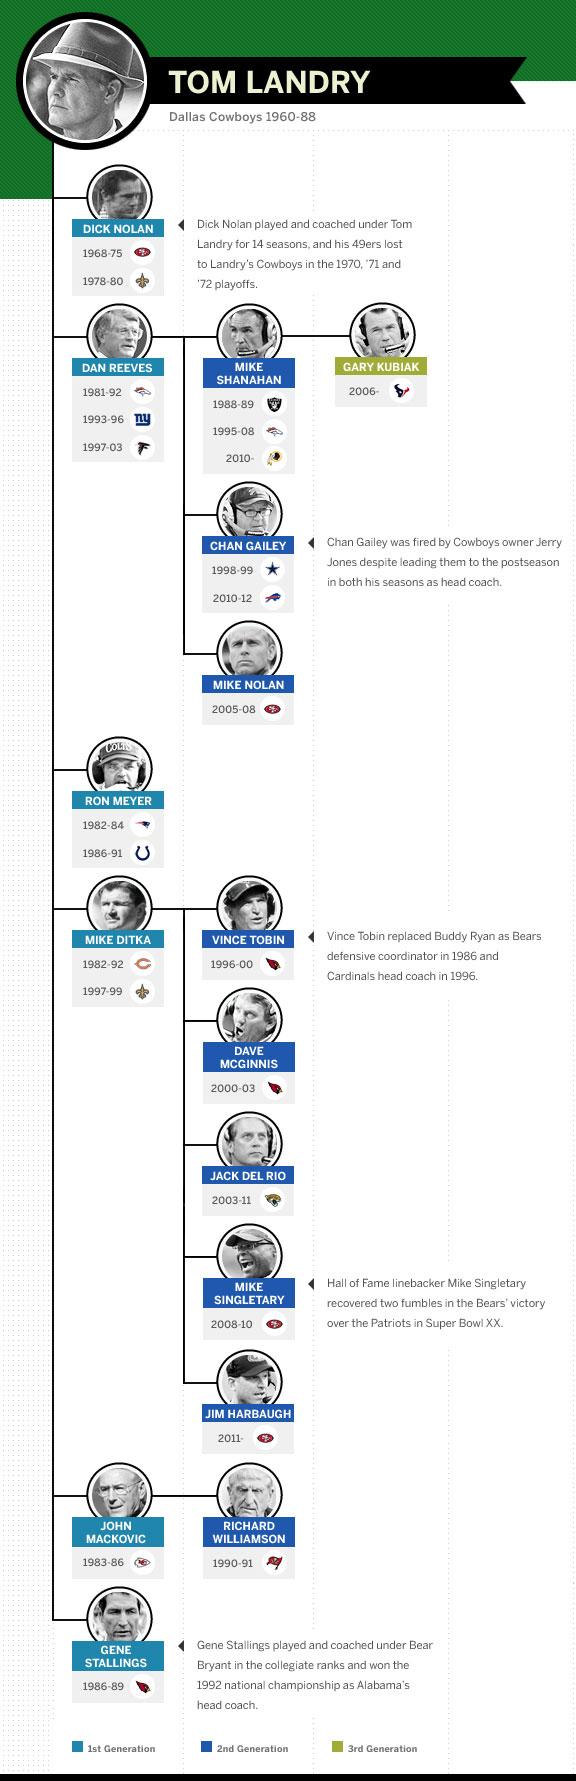 c17d05f5007 Greatest NFL Coaches - The Tom Landry coaching tree